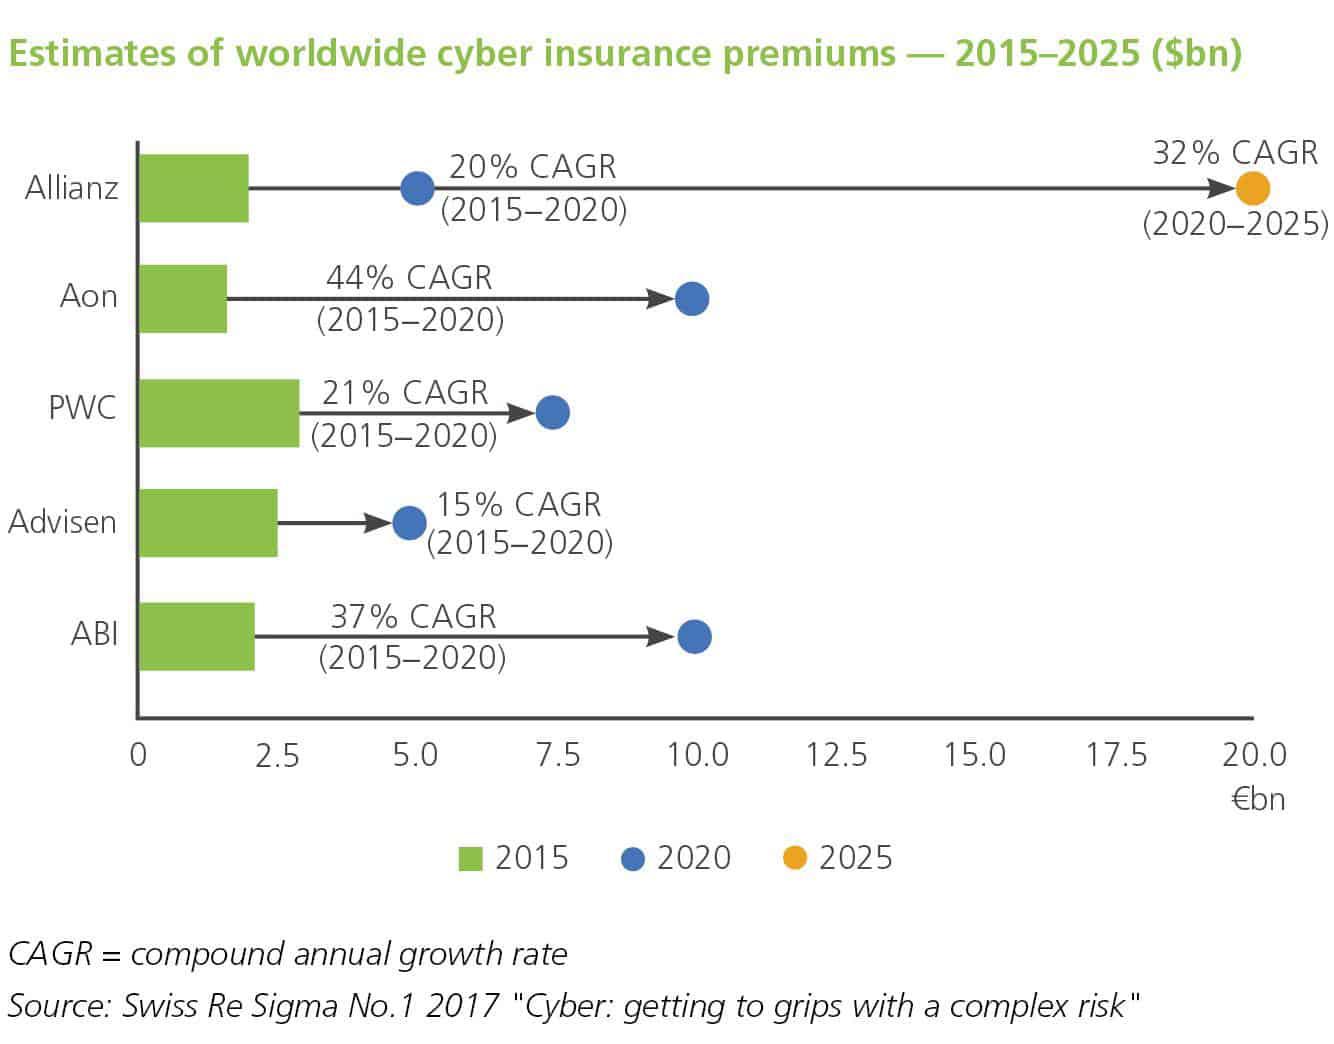 Swiss Re Cyber insurance premiums estimates